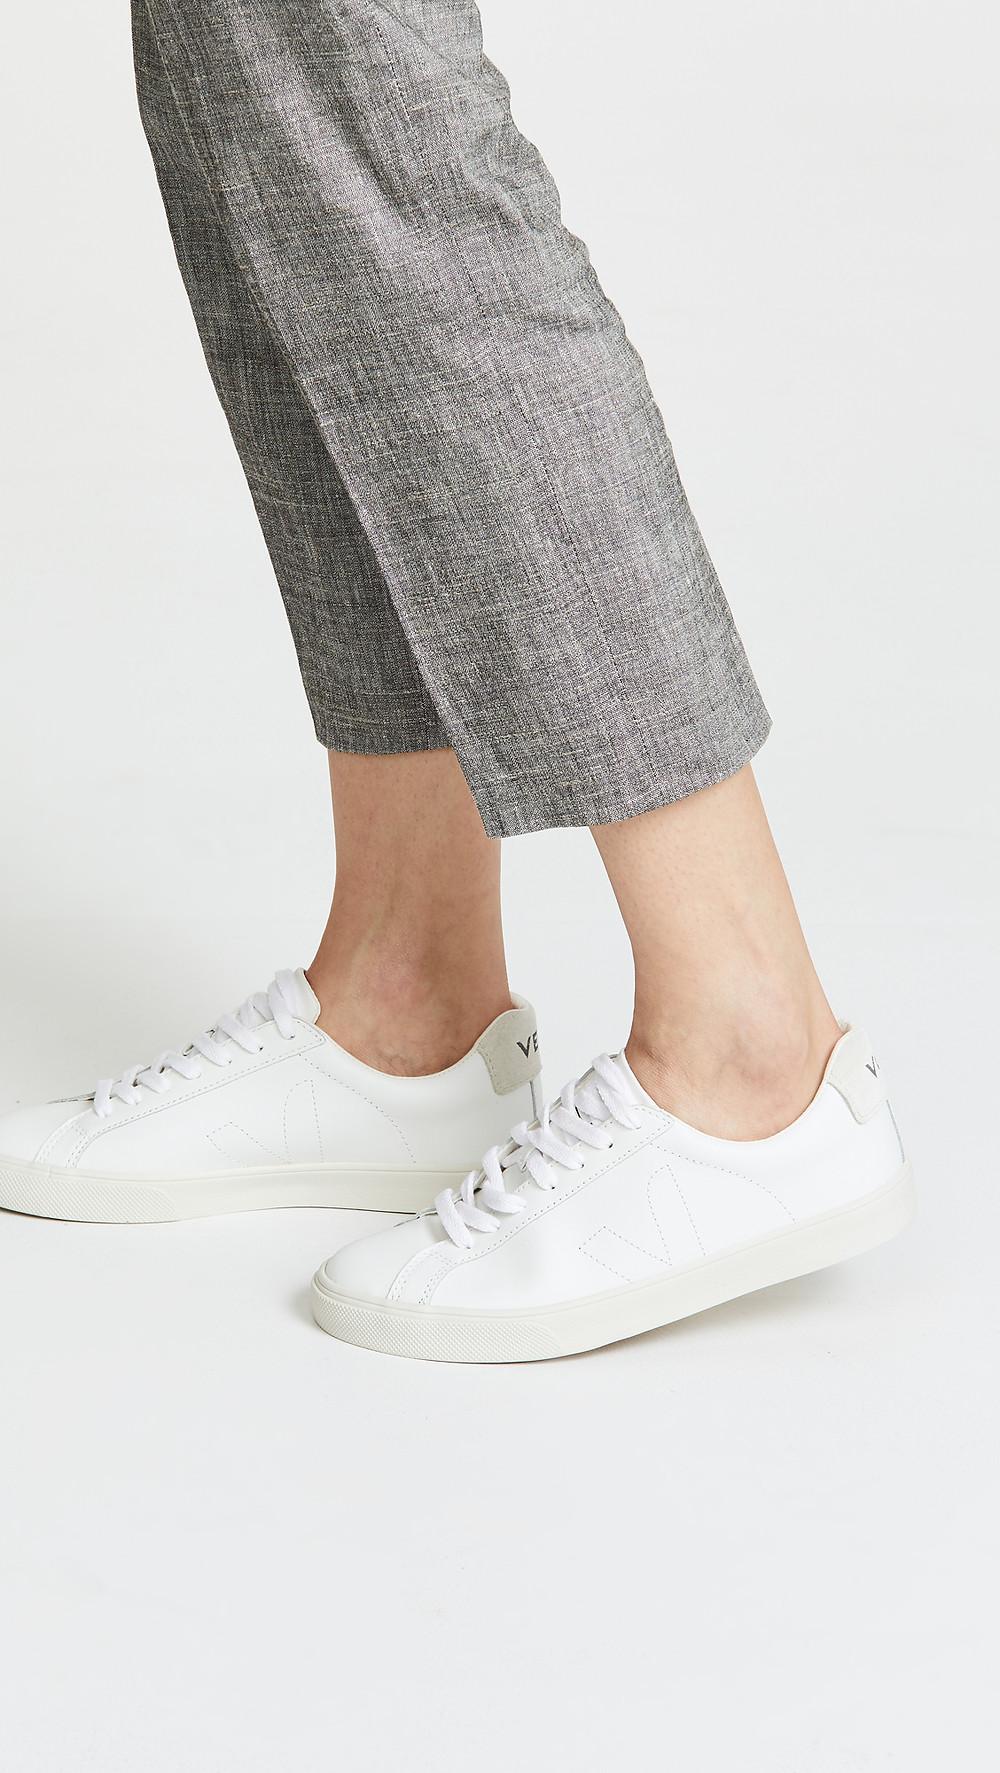 Veja Esplar Low Sneakers $120